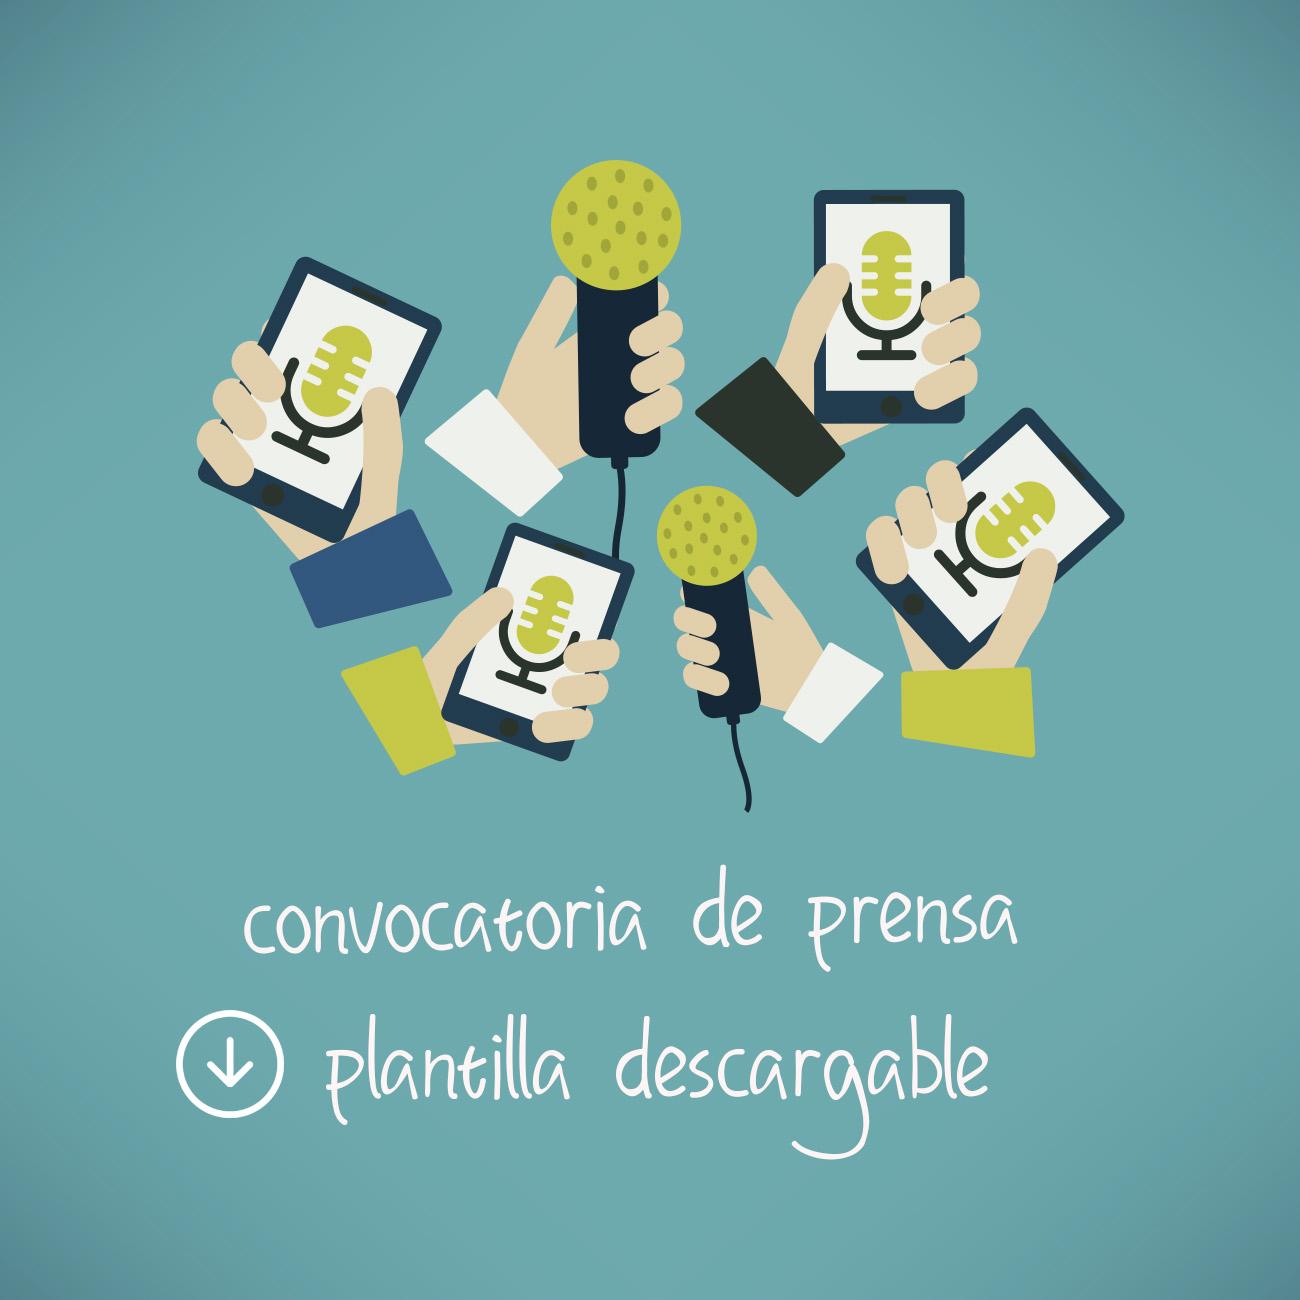 Convocatoria de Prensa plantilla